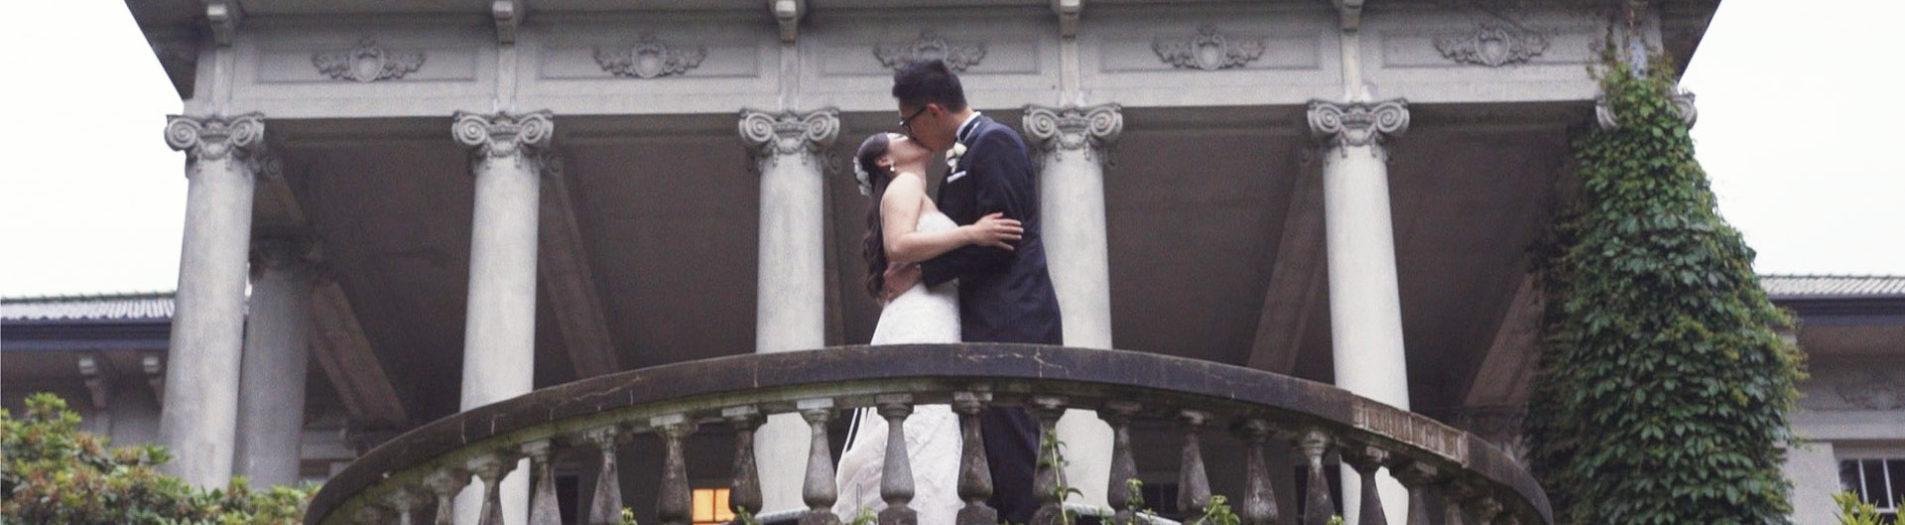 Michael + Olivia | Wedding Highlight Film | Hycroft Manor, Vanocuver BC